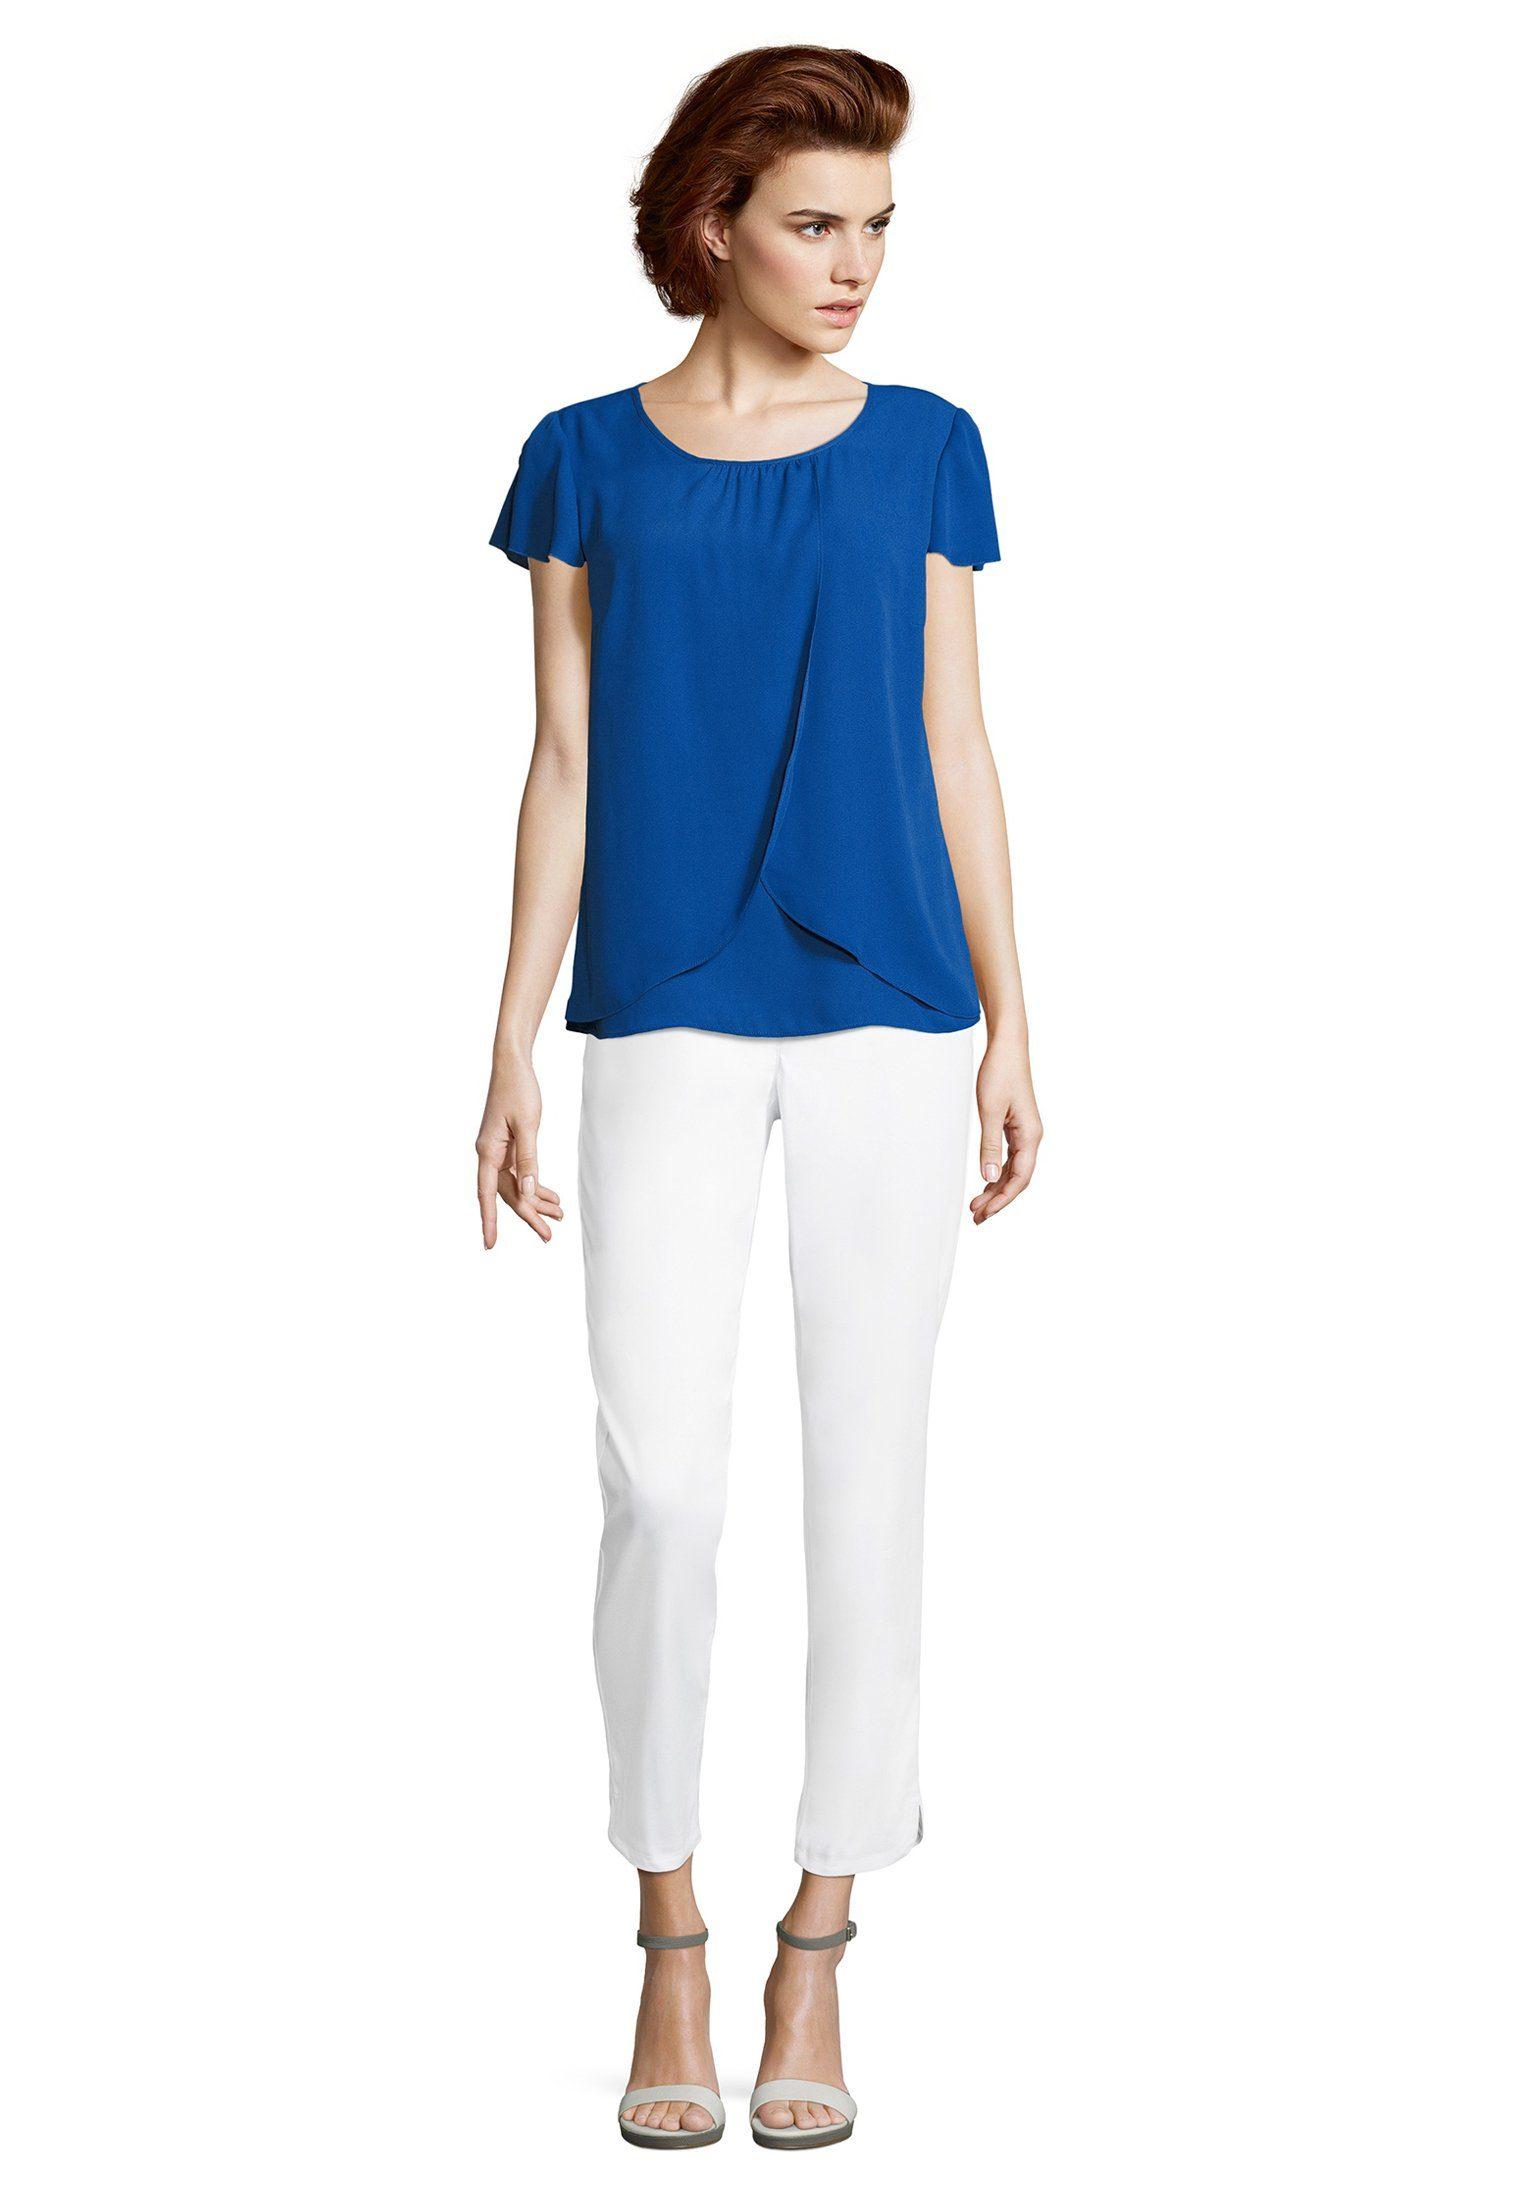 Betty Barclay Blusenshirt Unifarben Online Kaufen 0nwOPk